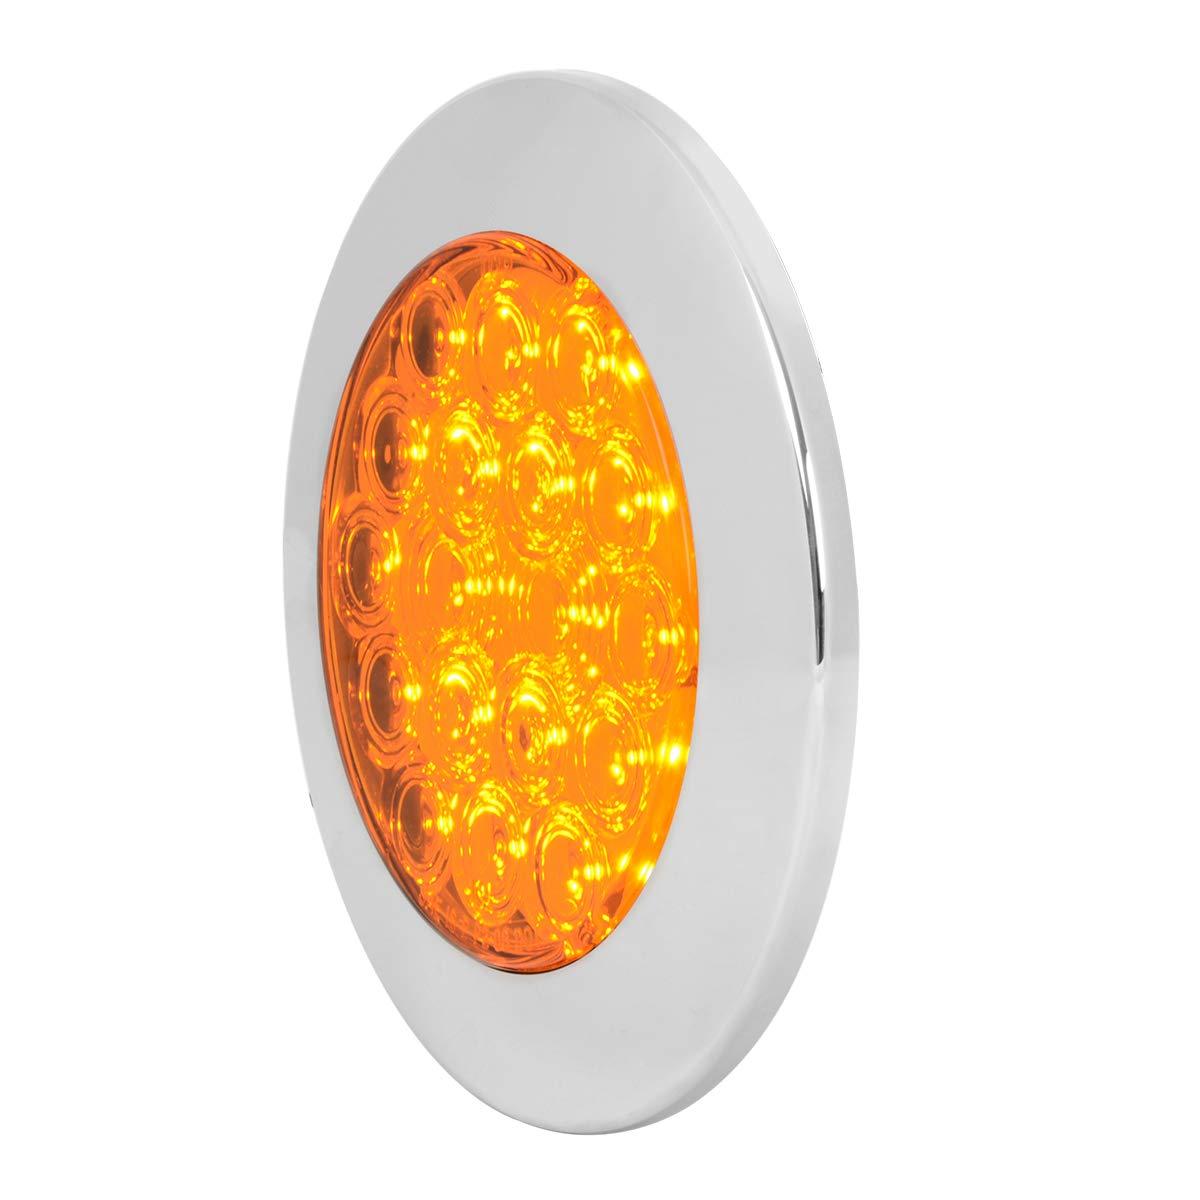 GG Grand General 75870 LED Light 4 Fleet Amber 18 Flange Mount with Bezel, 3 Prong